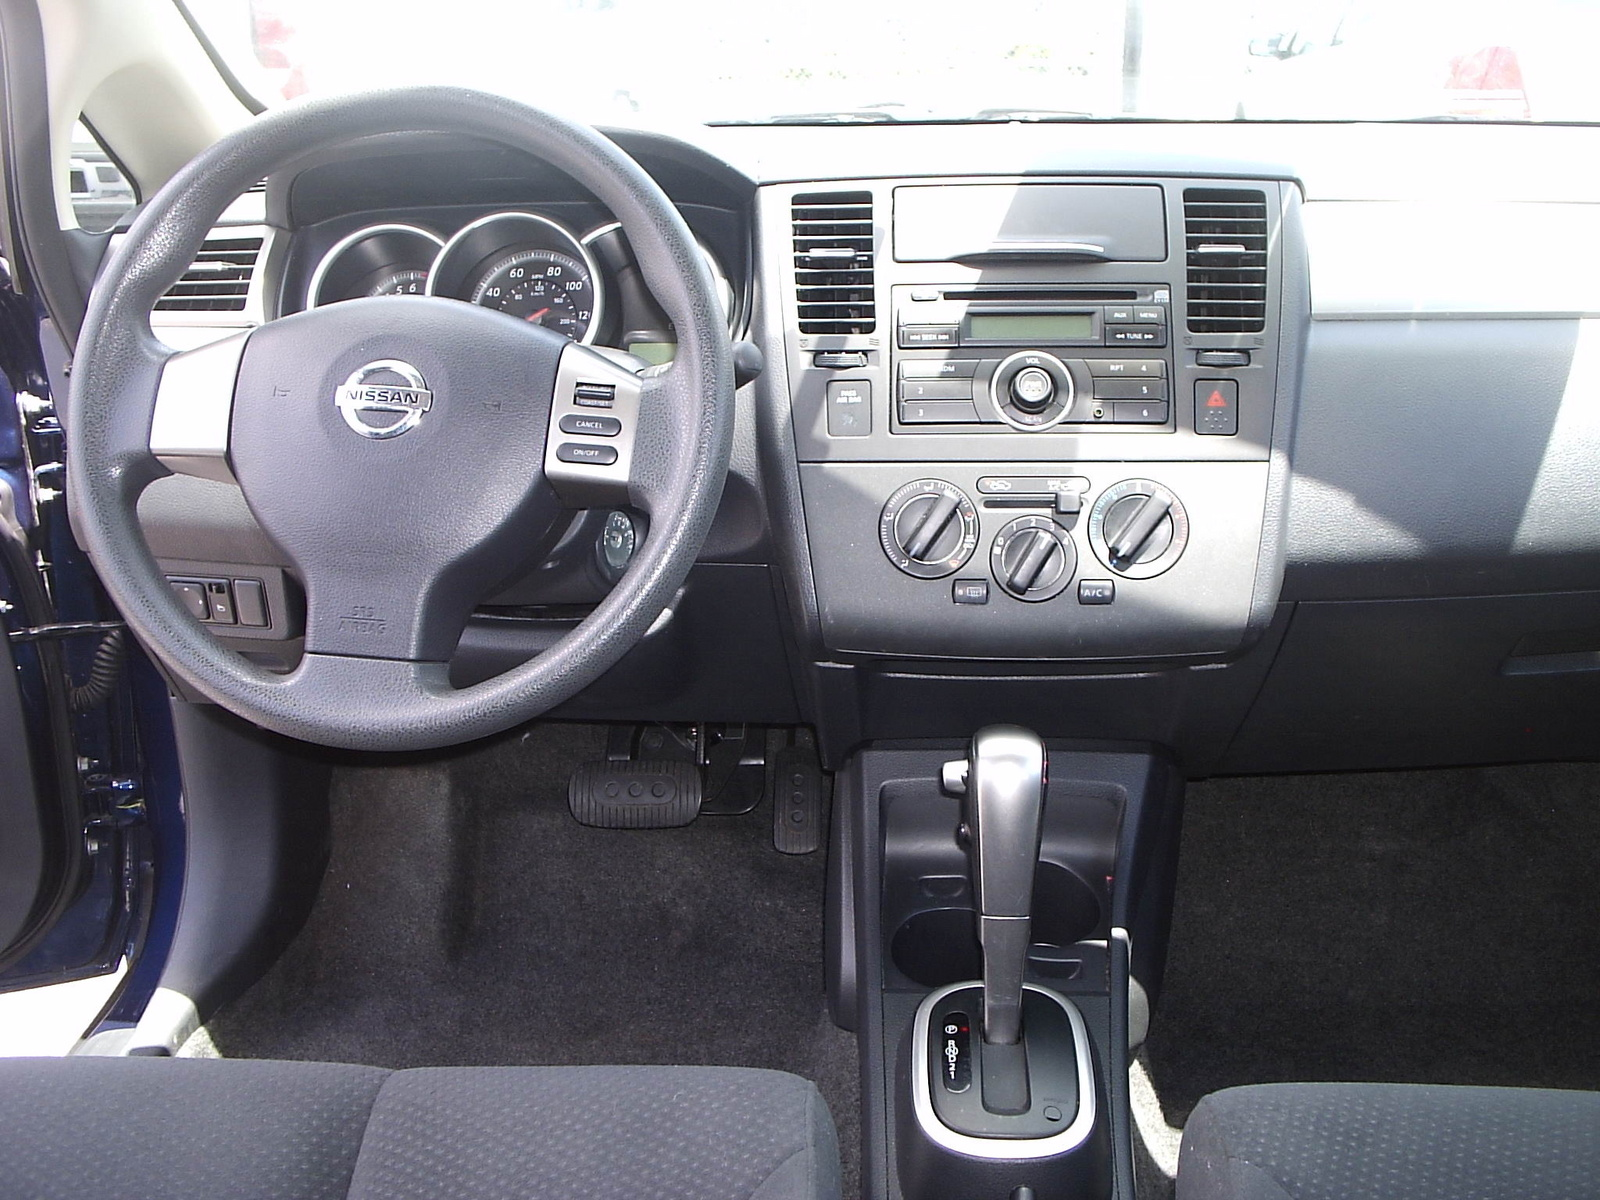 2010 nissan versa interior dimensions for Nissan versa note interior dimensions